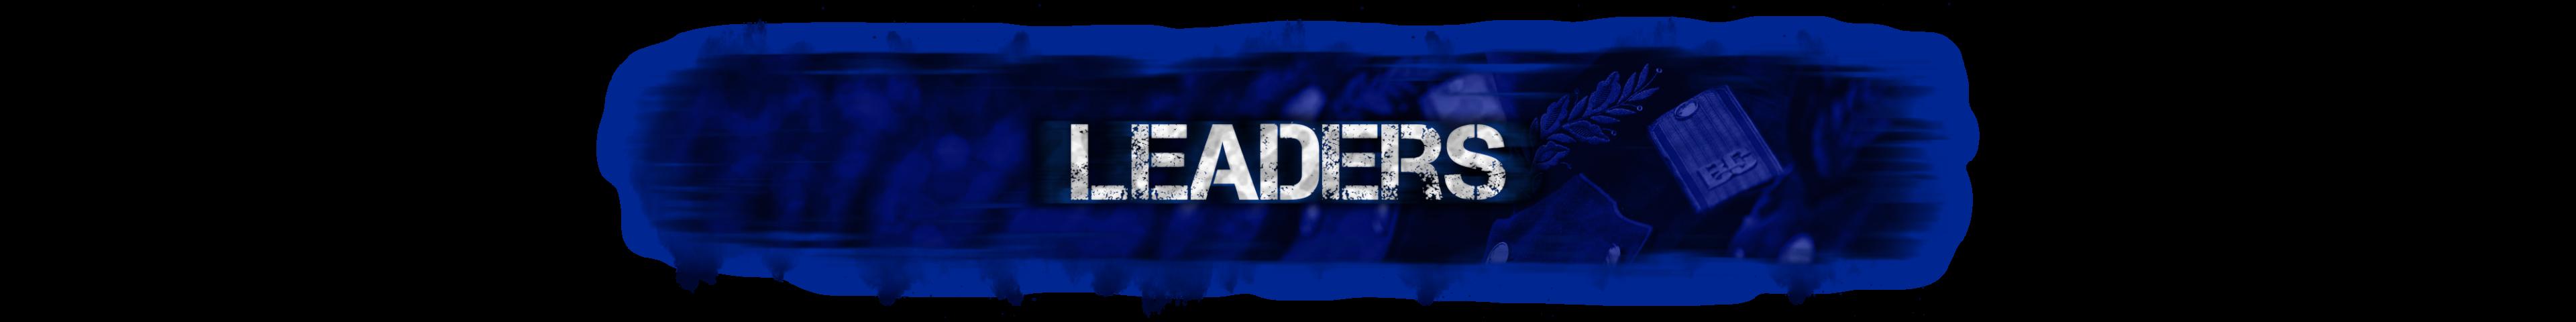 Leaders.thumb.png.dfd504480fc1da8ef990d33d5ce5390f.png